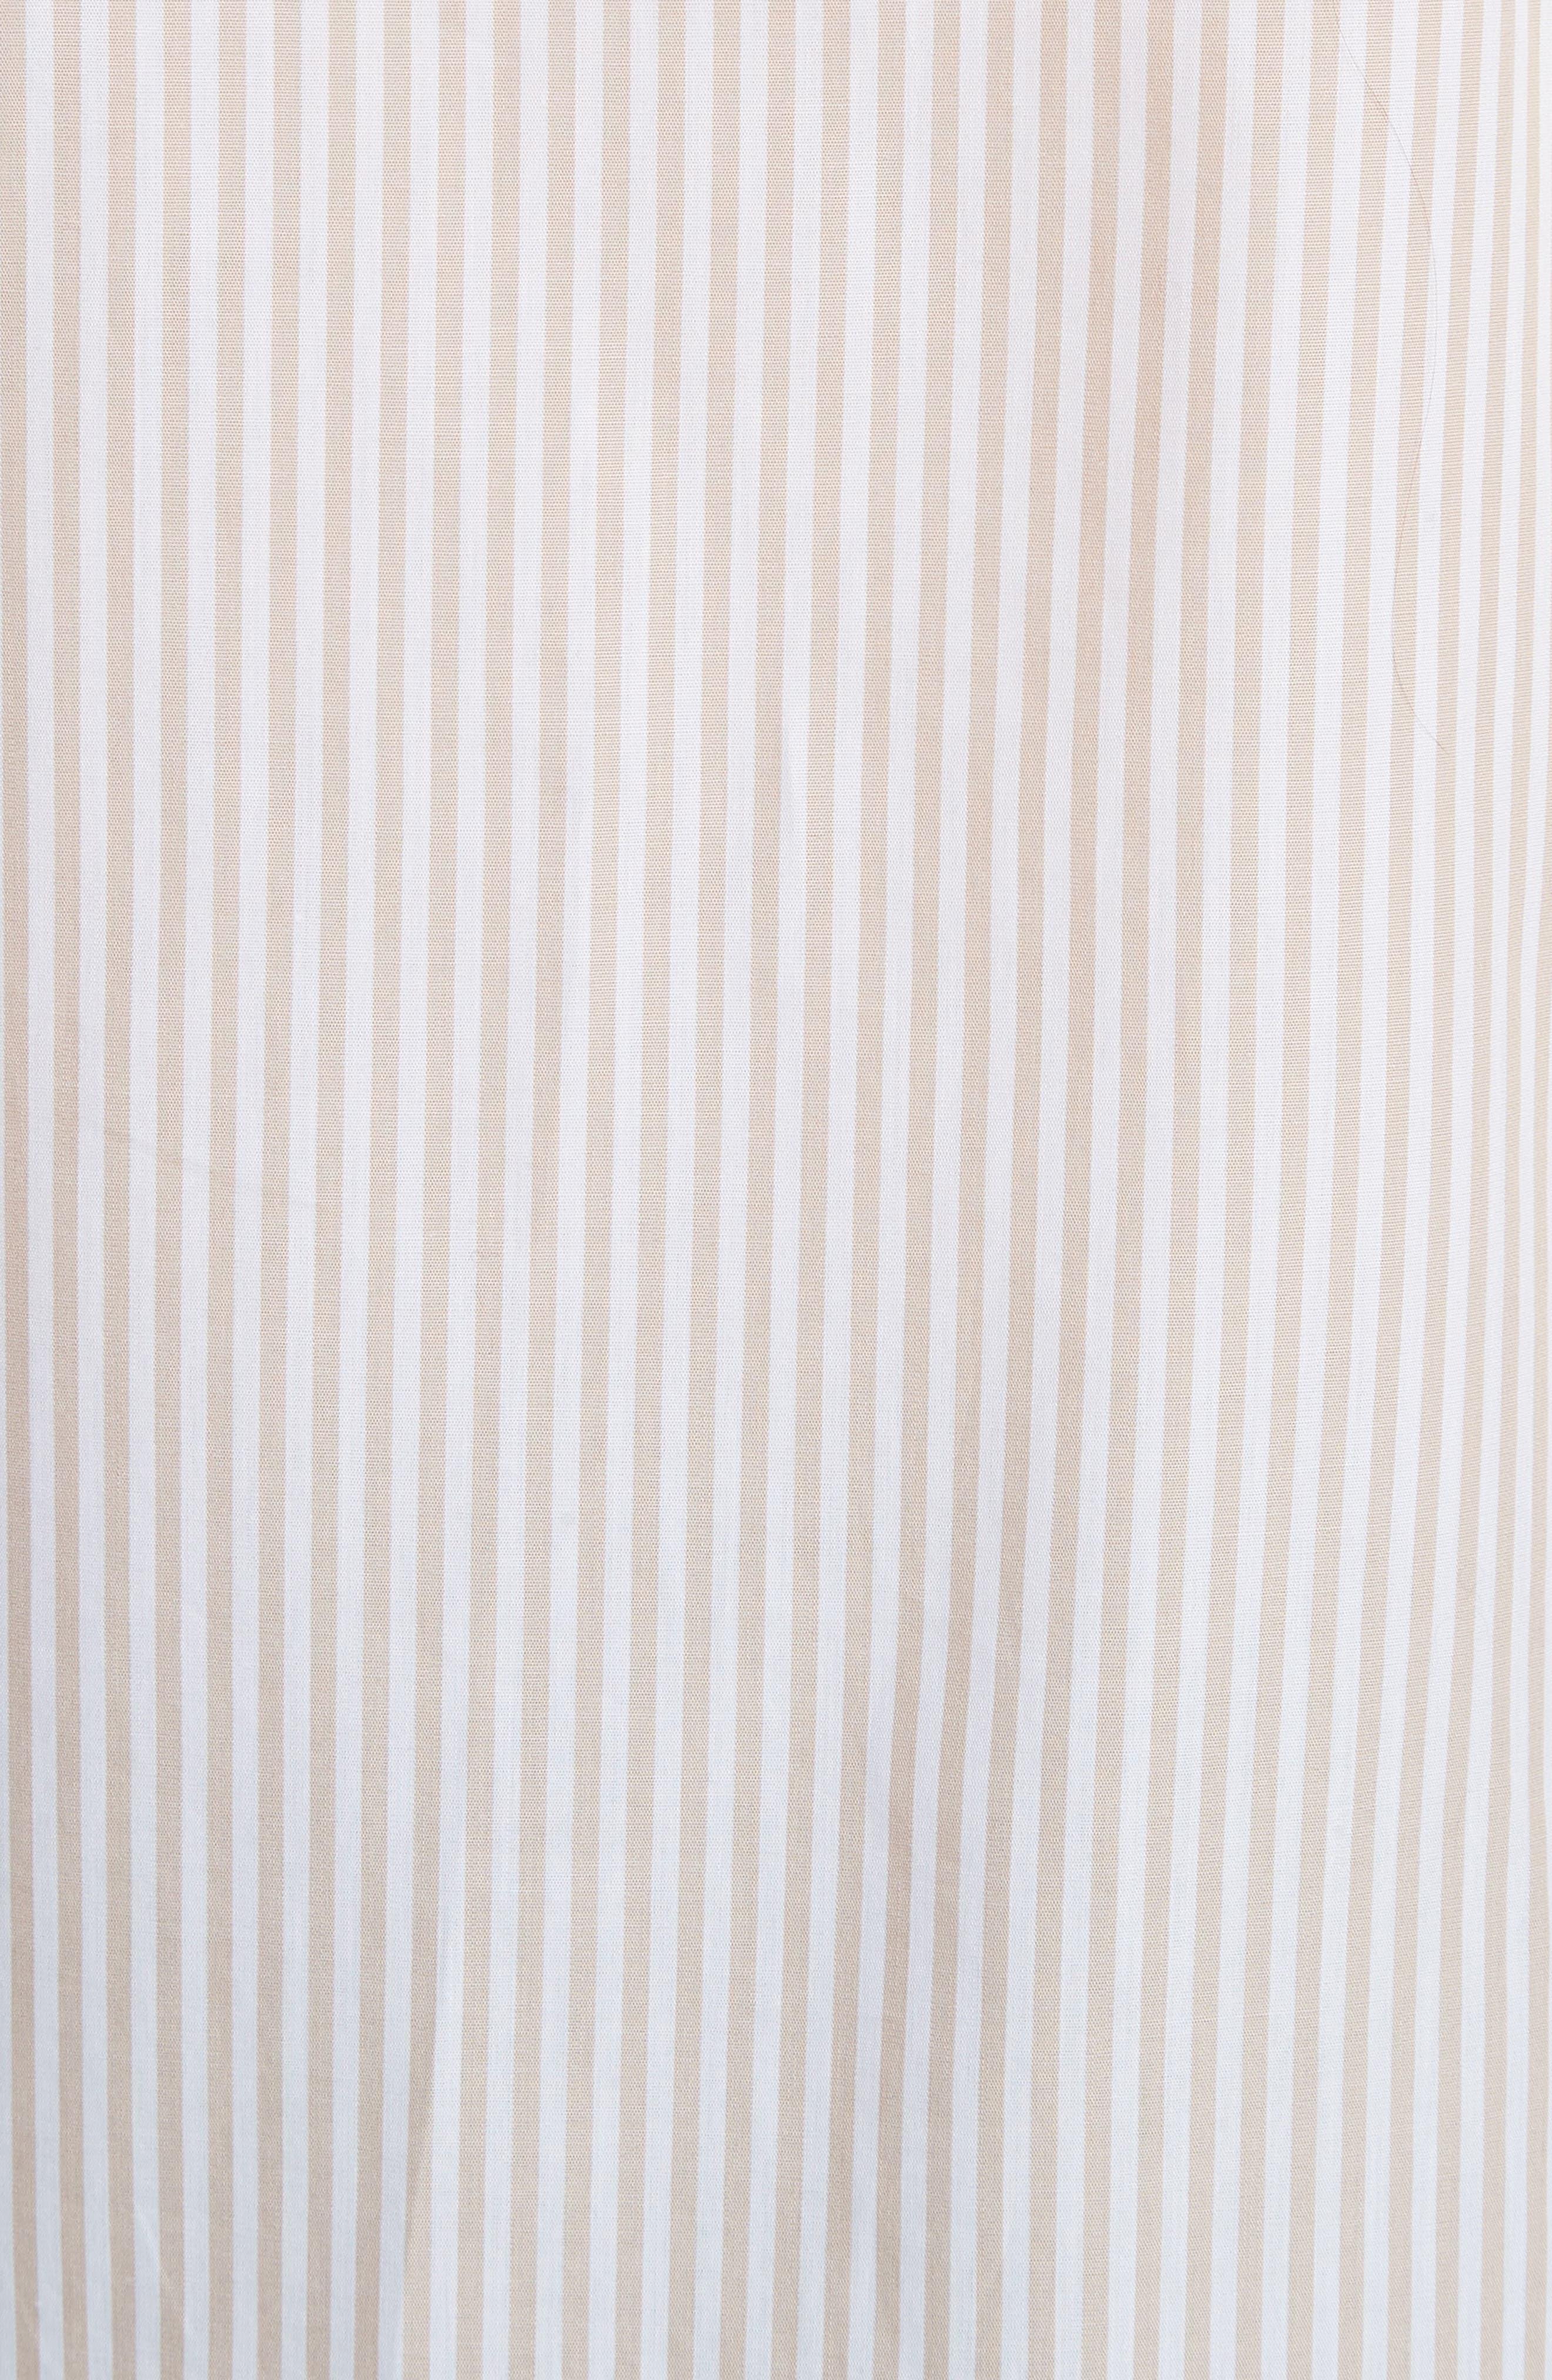 Stripe Cotton Shirt,                             Alternate thumbnail 5, color,                             Beige-White